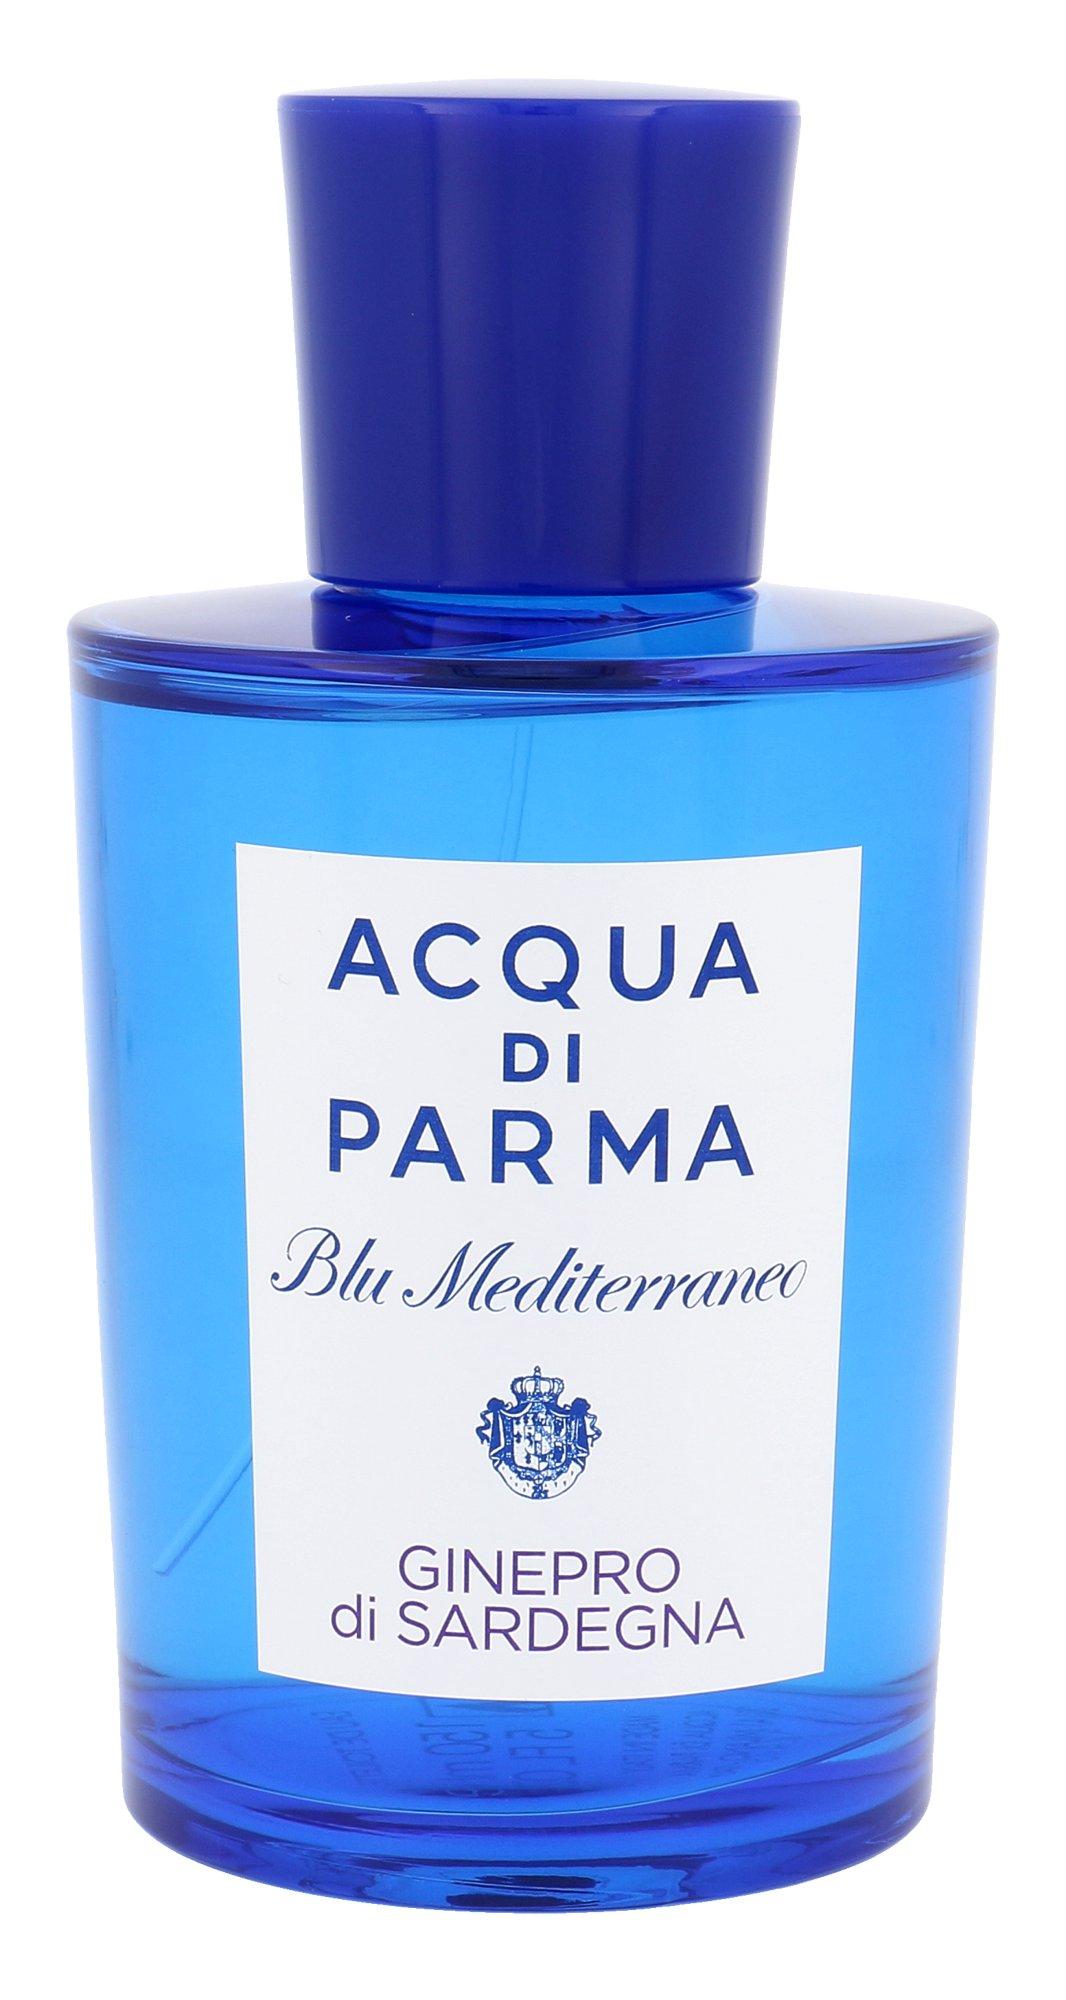 Acqua di Parma Blu Mediterraneo Ginepro di Sardegna, Toaletná voda 75ml